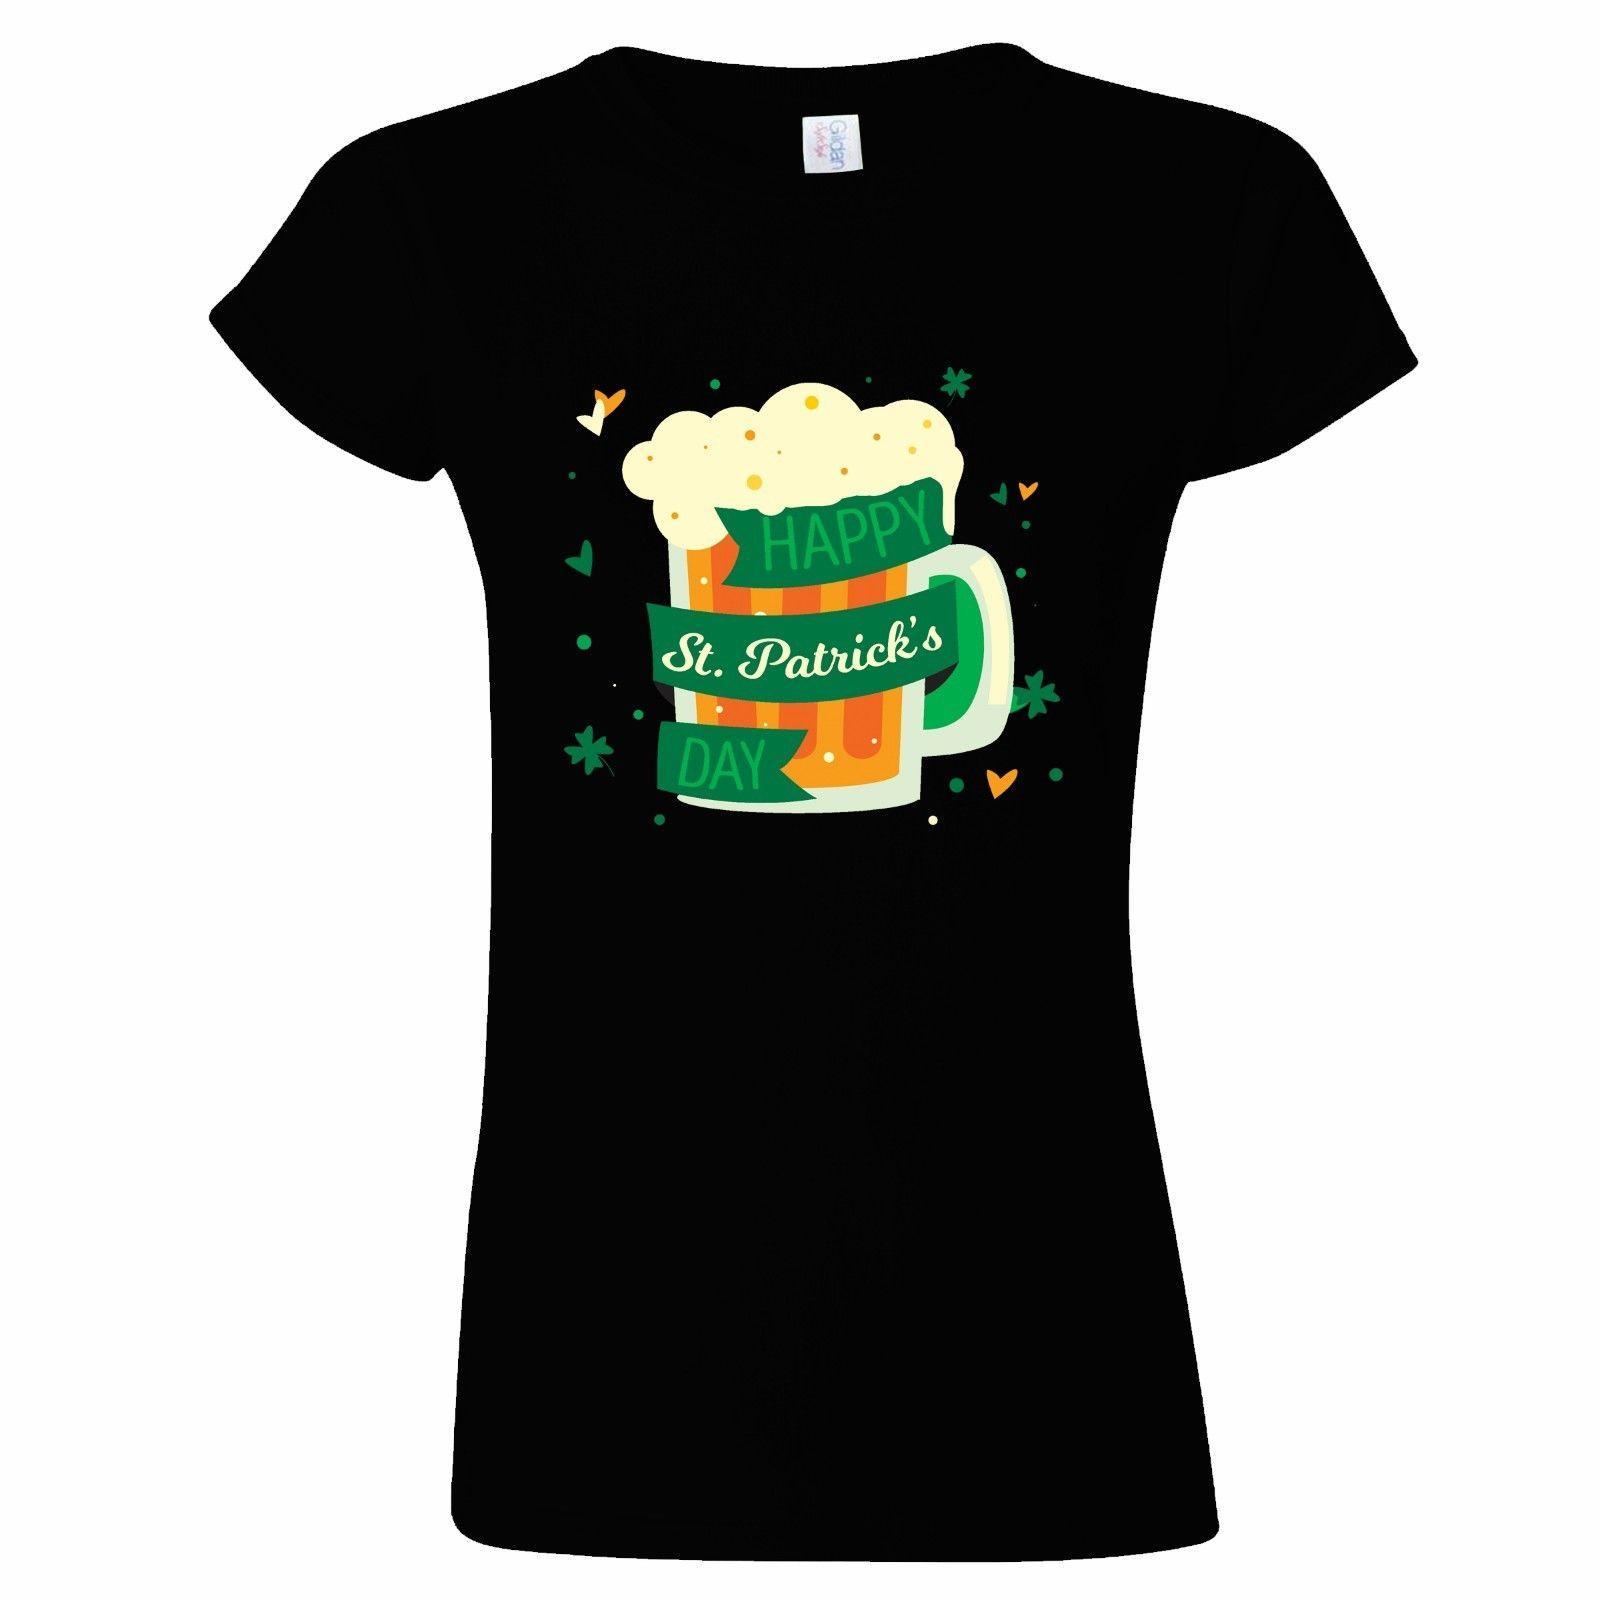 2958e2da ST PATRICKS DAY BEER MUG DESIGN WOMENS T SHIRT IRISH IRELAND DRINK BEER  PATRICK One Day T Shirt Best Site For T Shirts From Bangtidyclothing,  $10.9  DHgate.